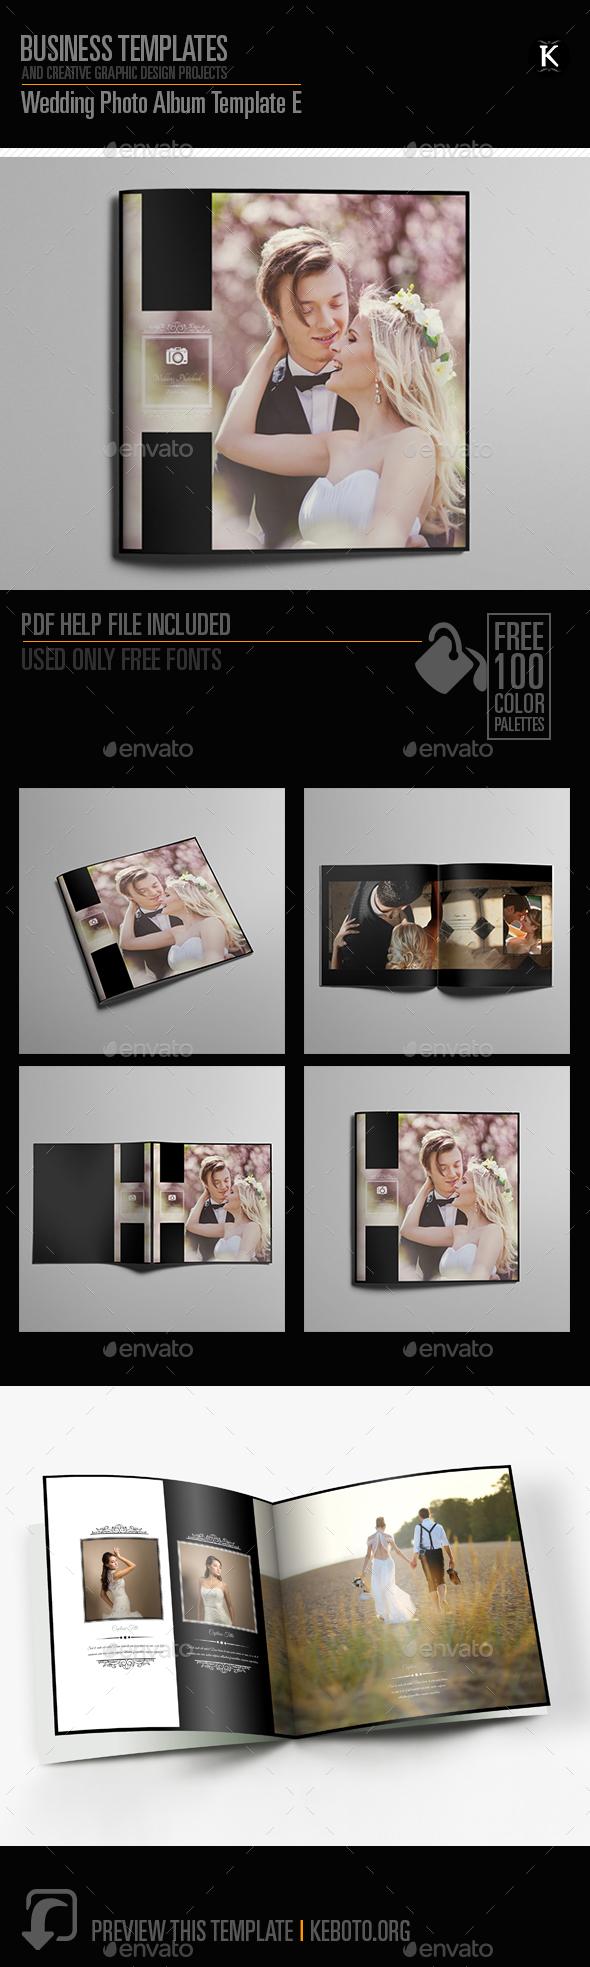 Wedding Photo Album Template E By Keboto Graphicriver